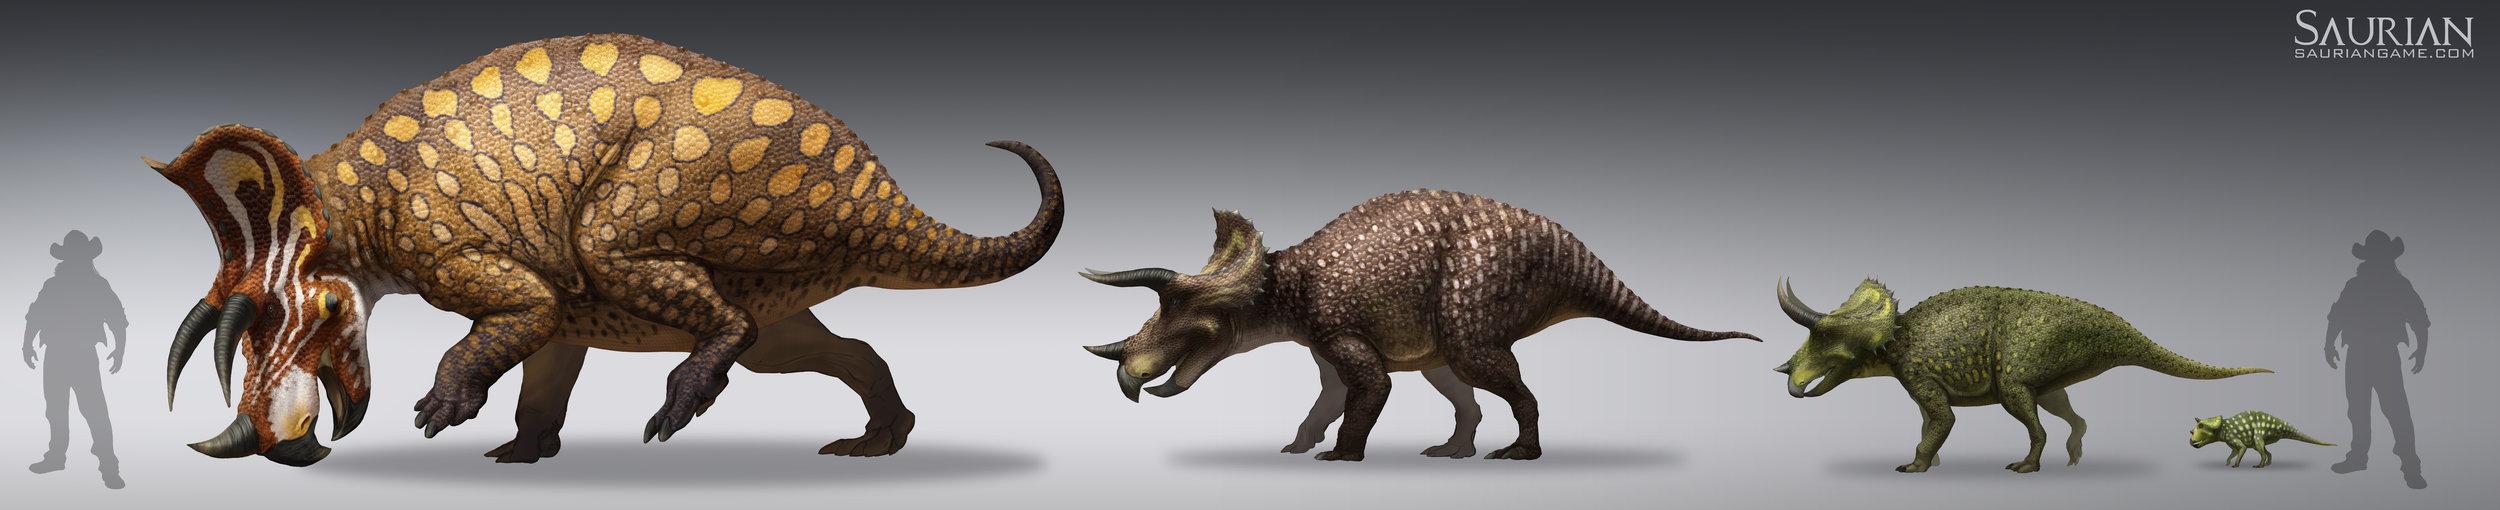 rjpalmer_triceratops_ontogeny_001.JPG